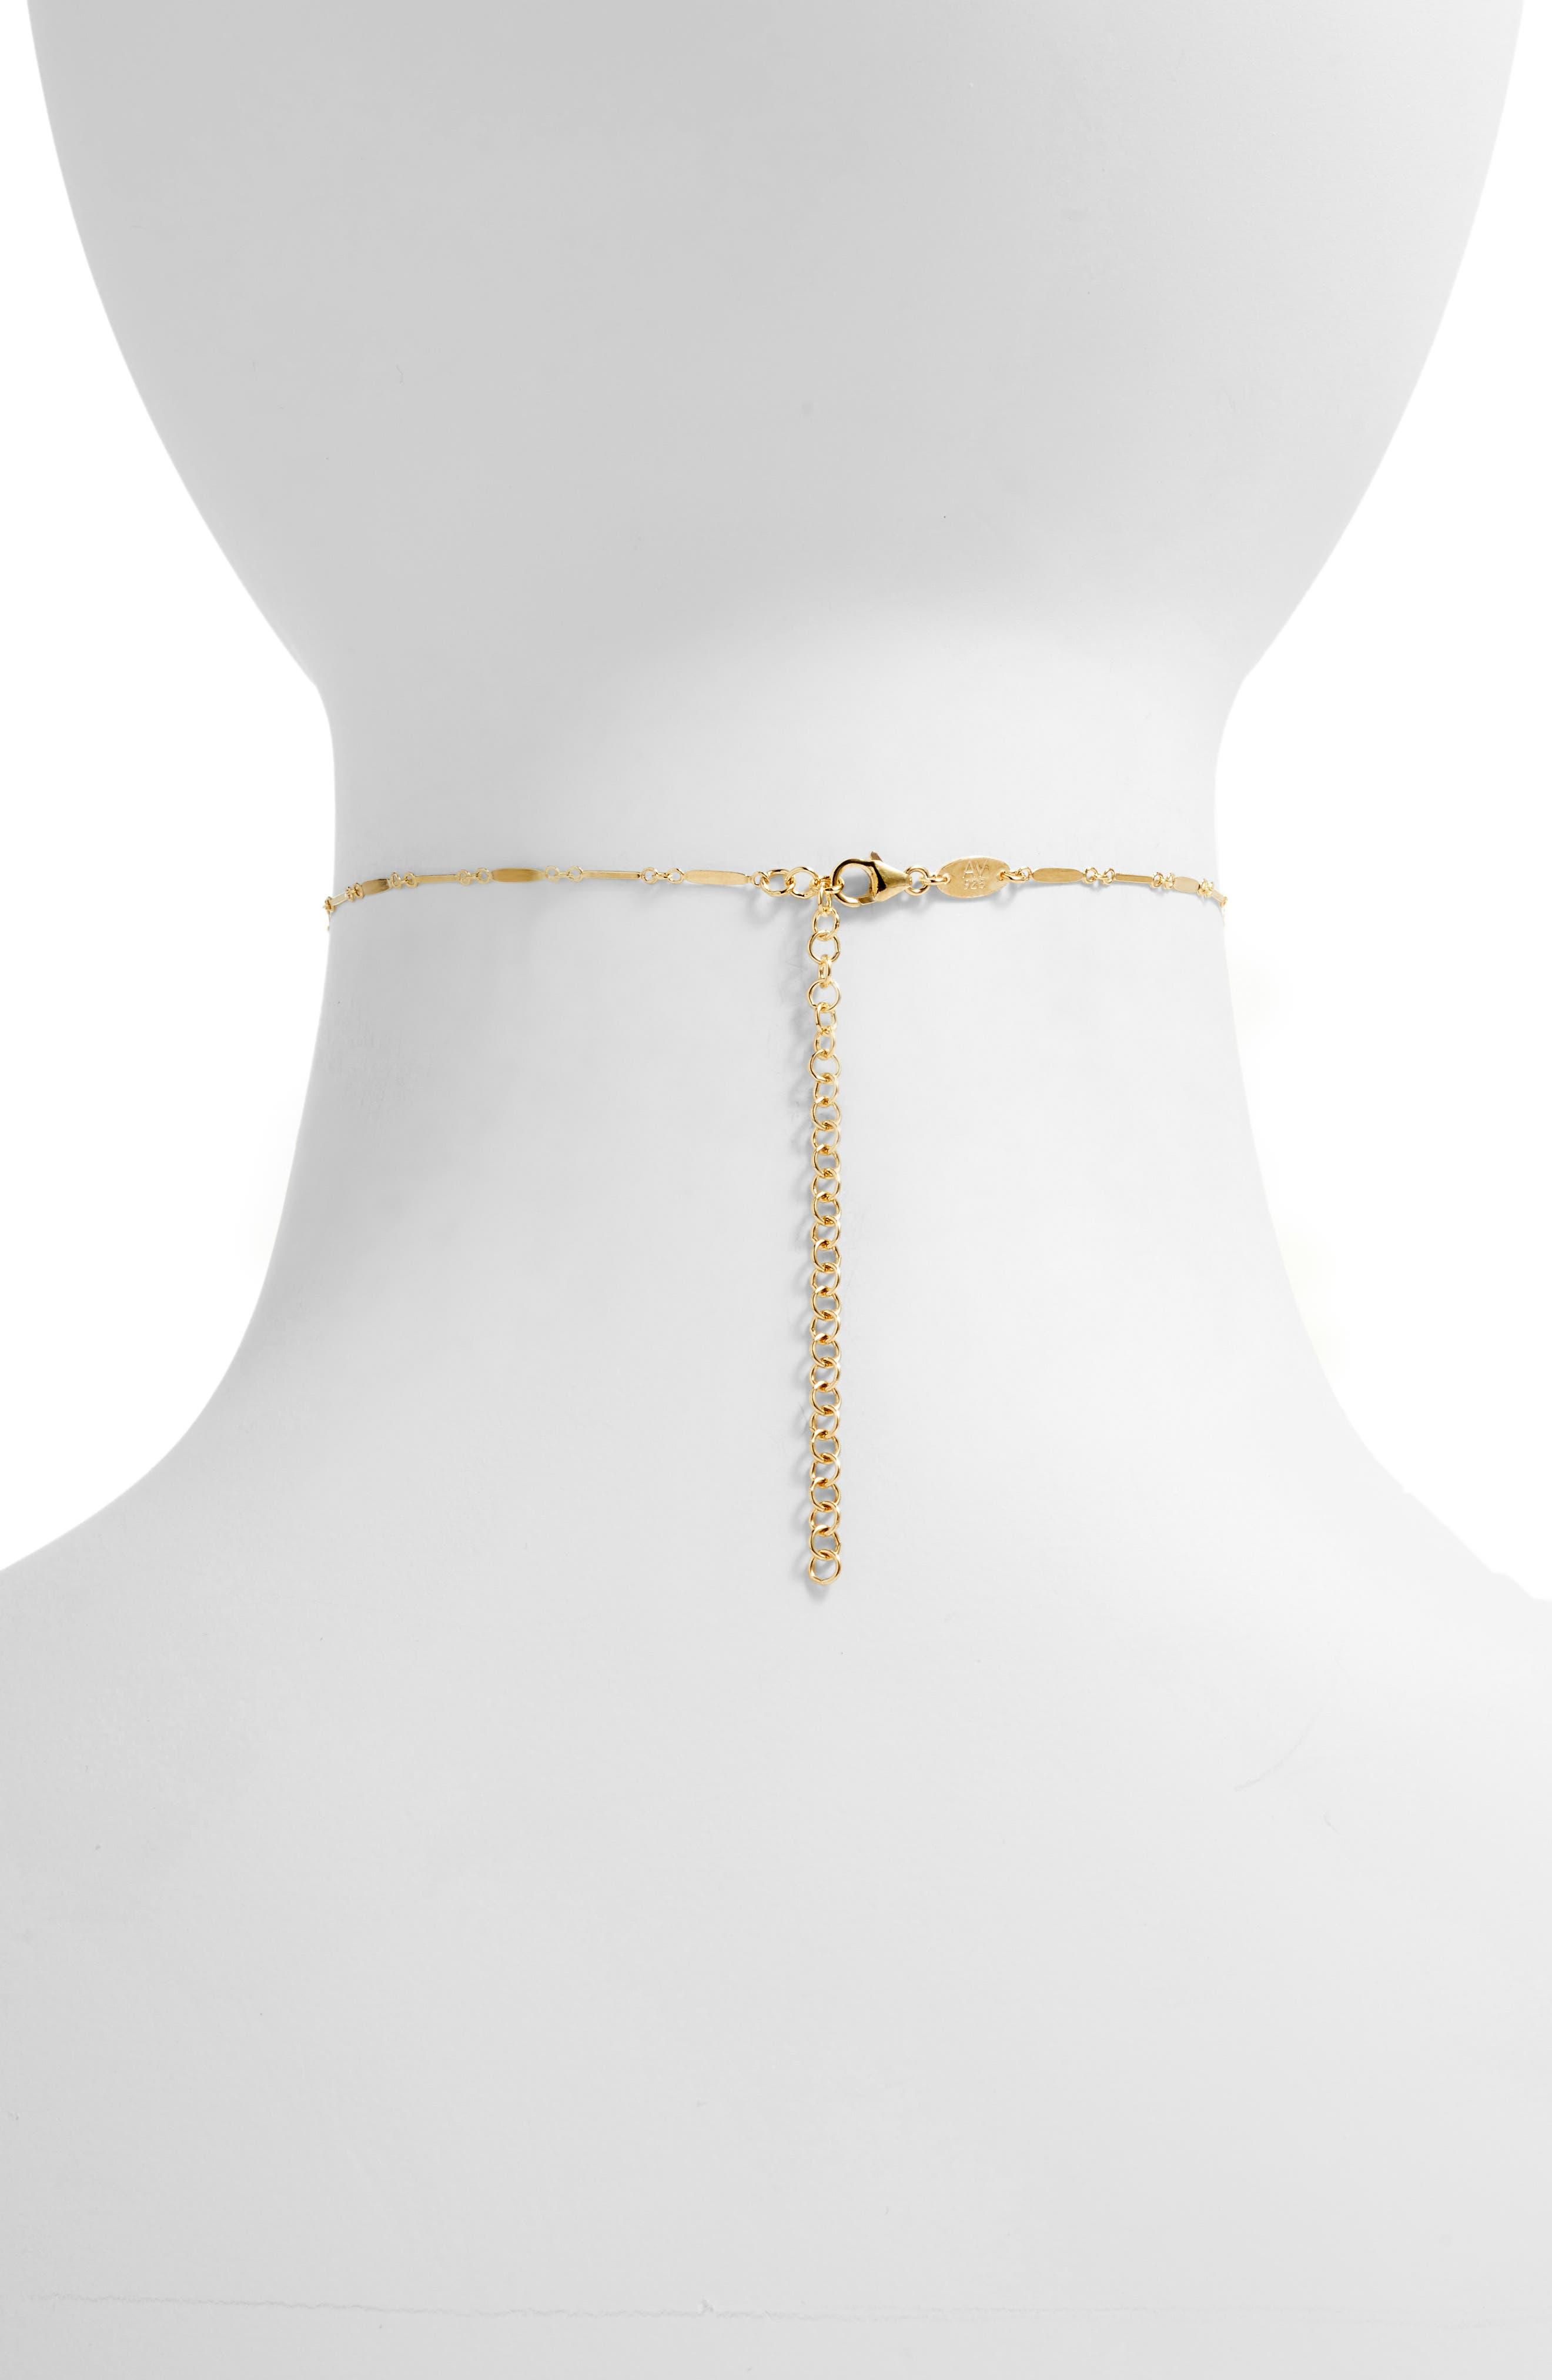 Mirror Bar Choker Necklace,                             Alternate thumbnail 3, color,                             GOLD